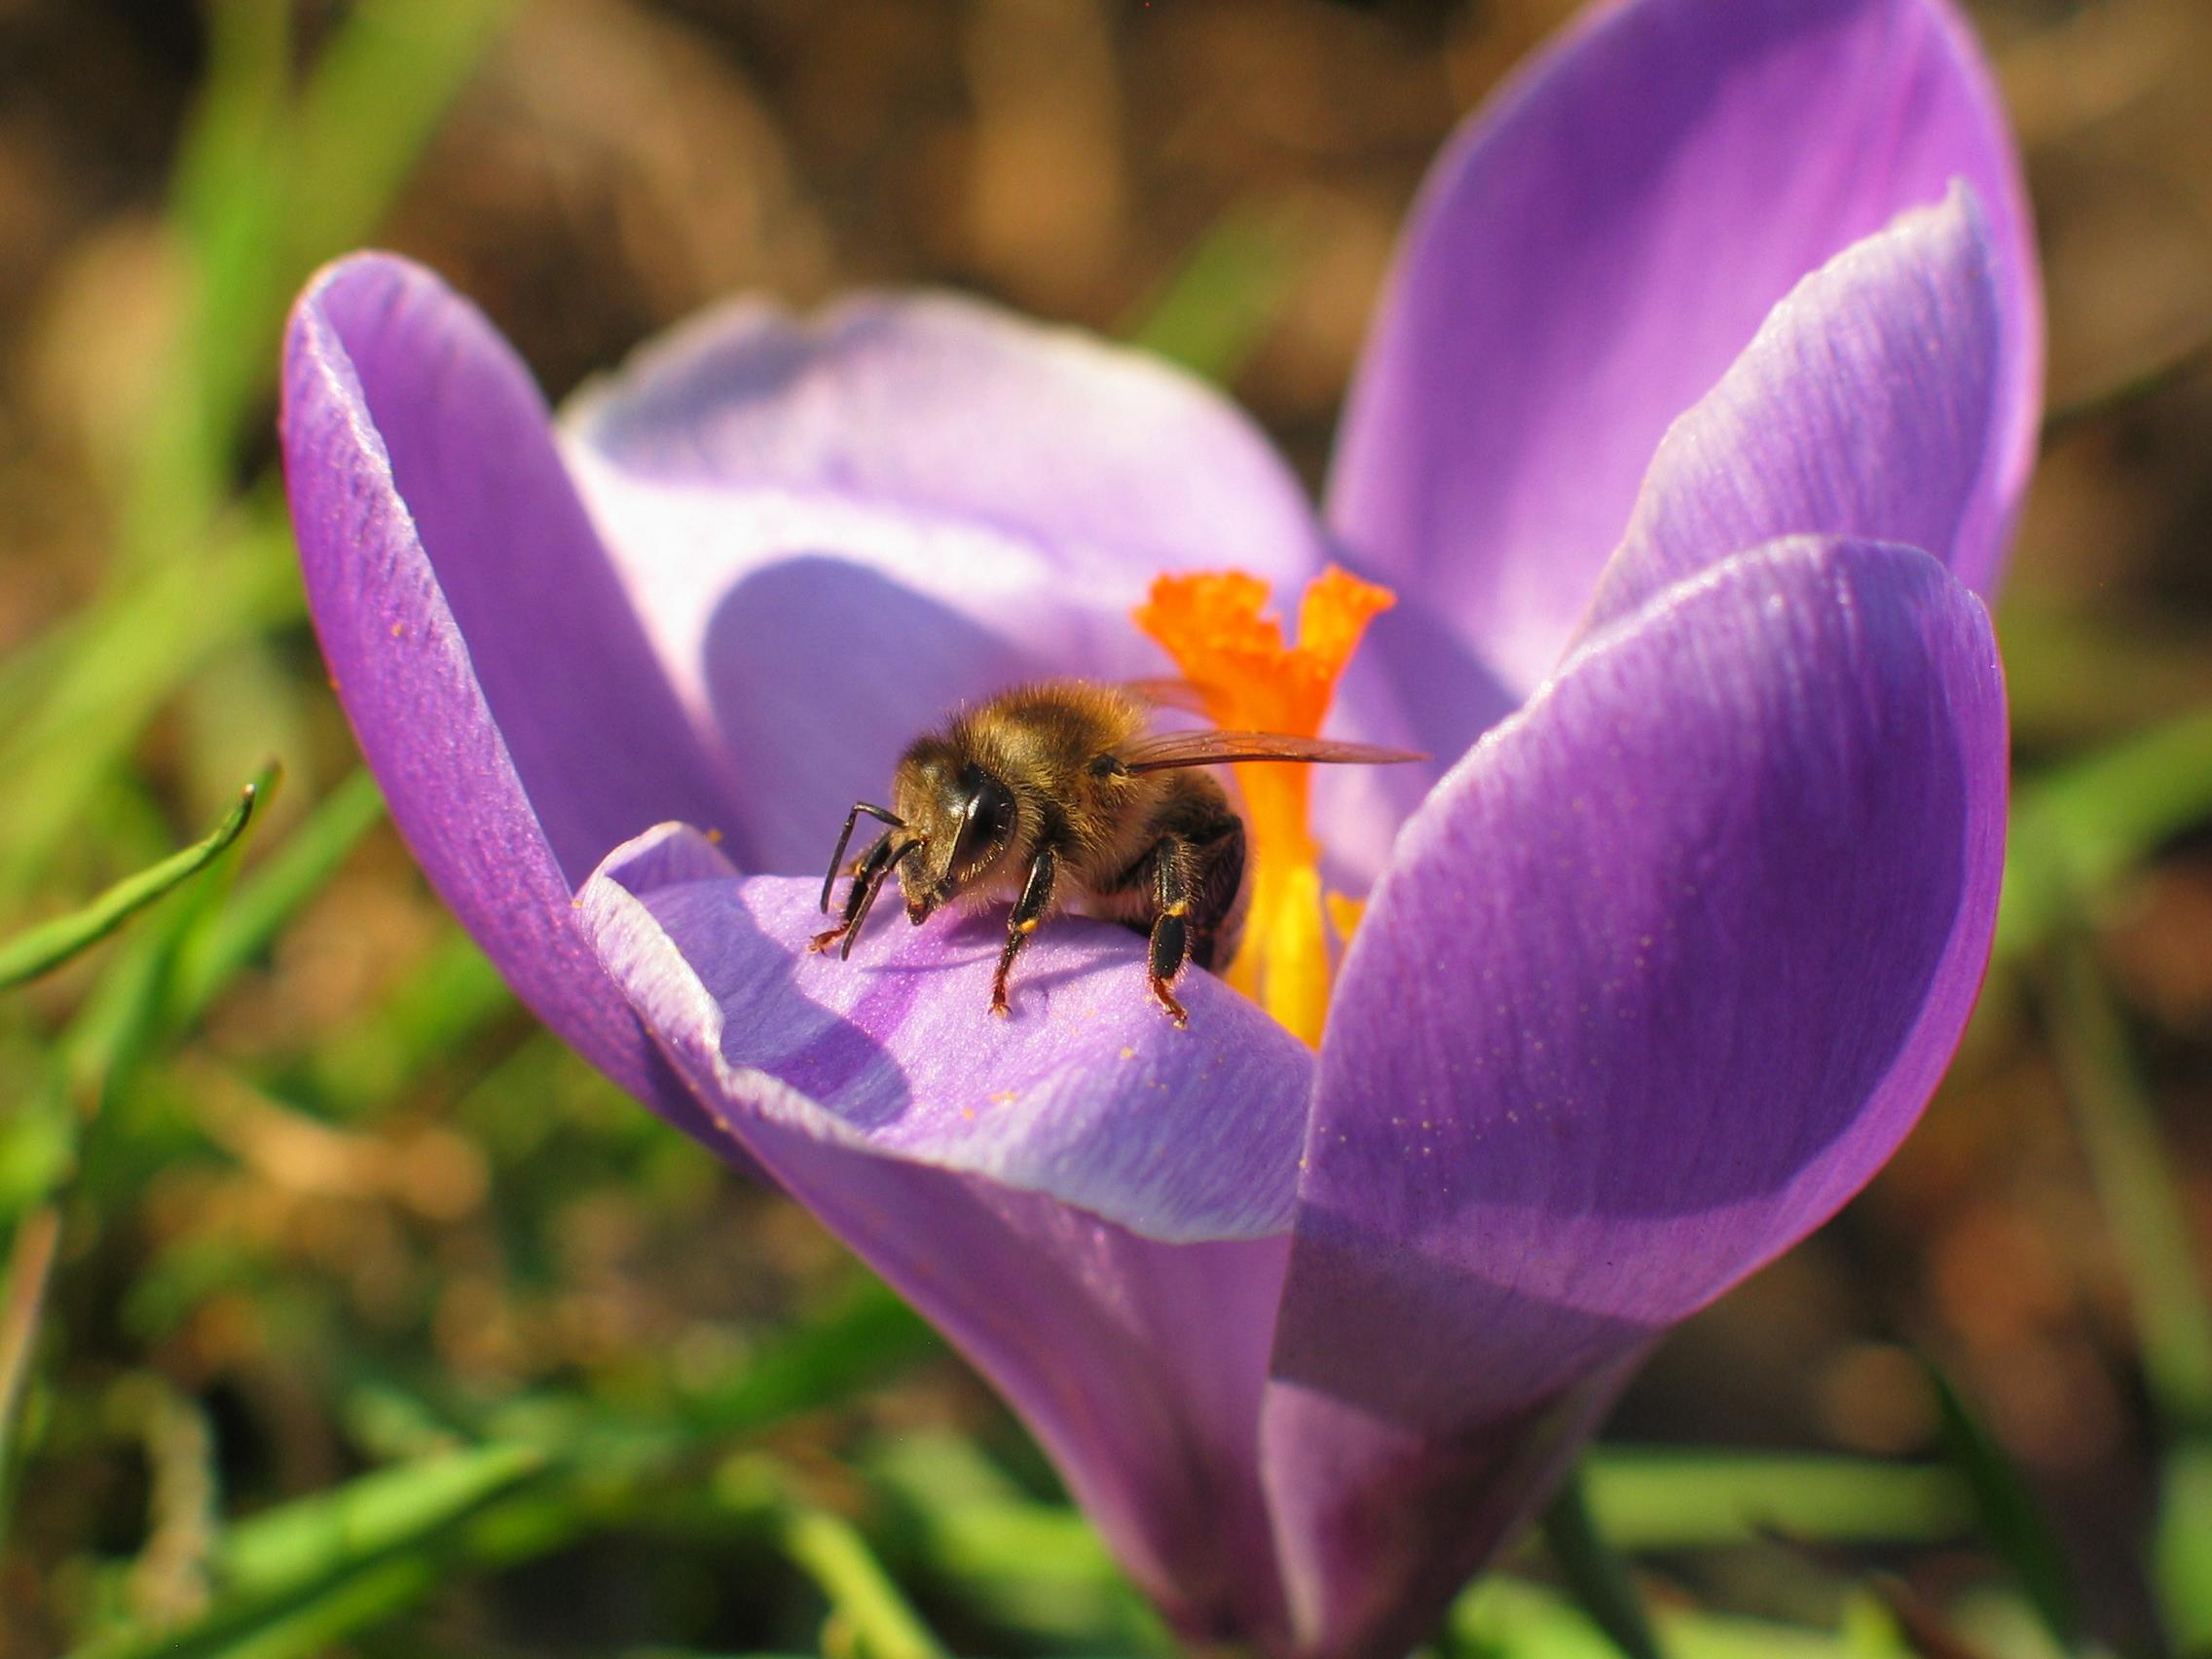 Bees on crocus photo